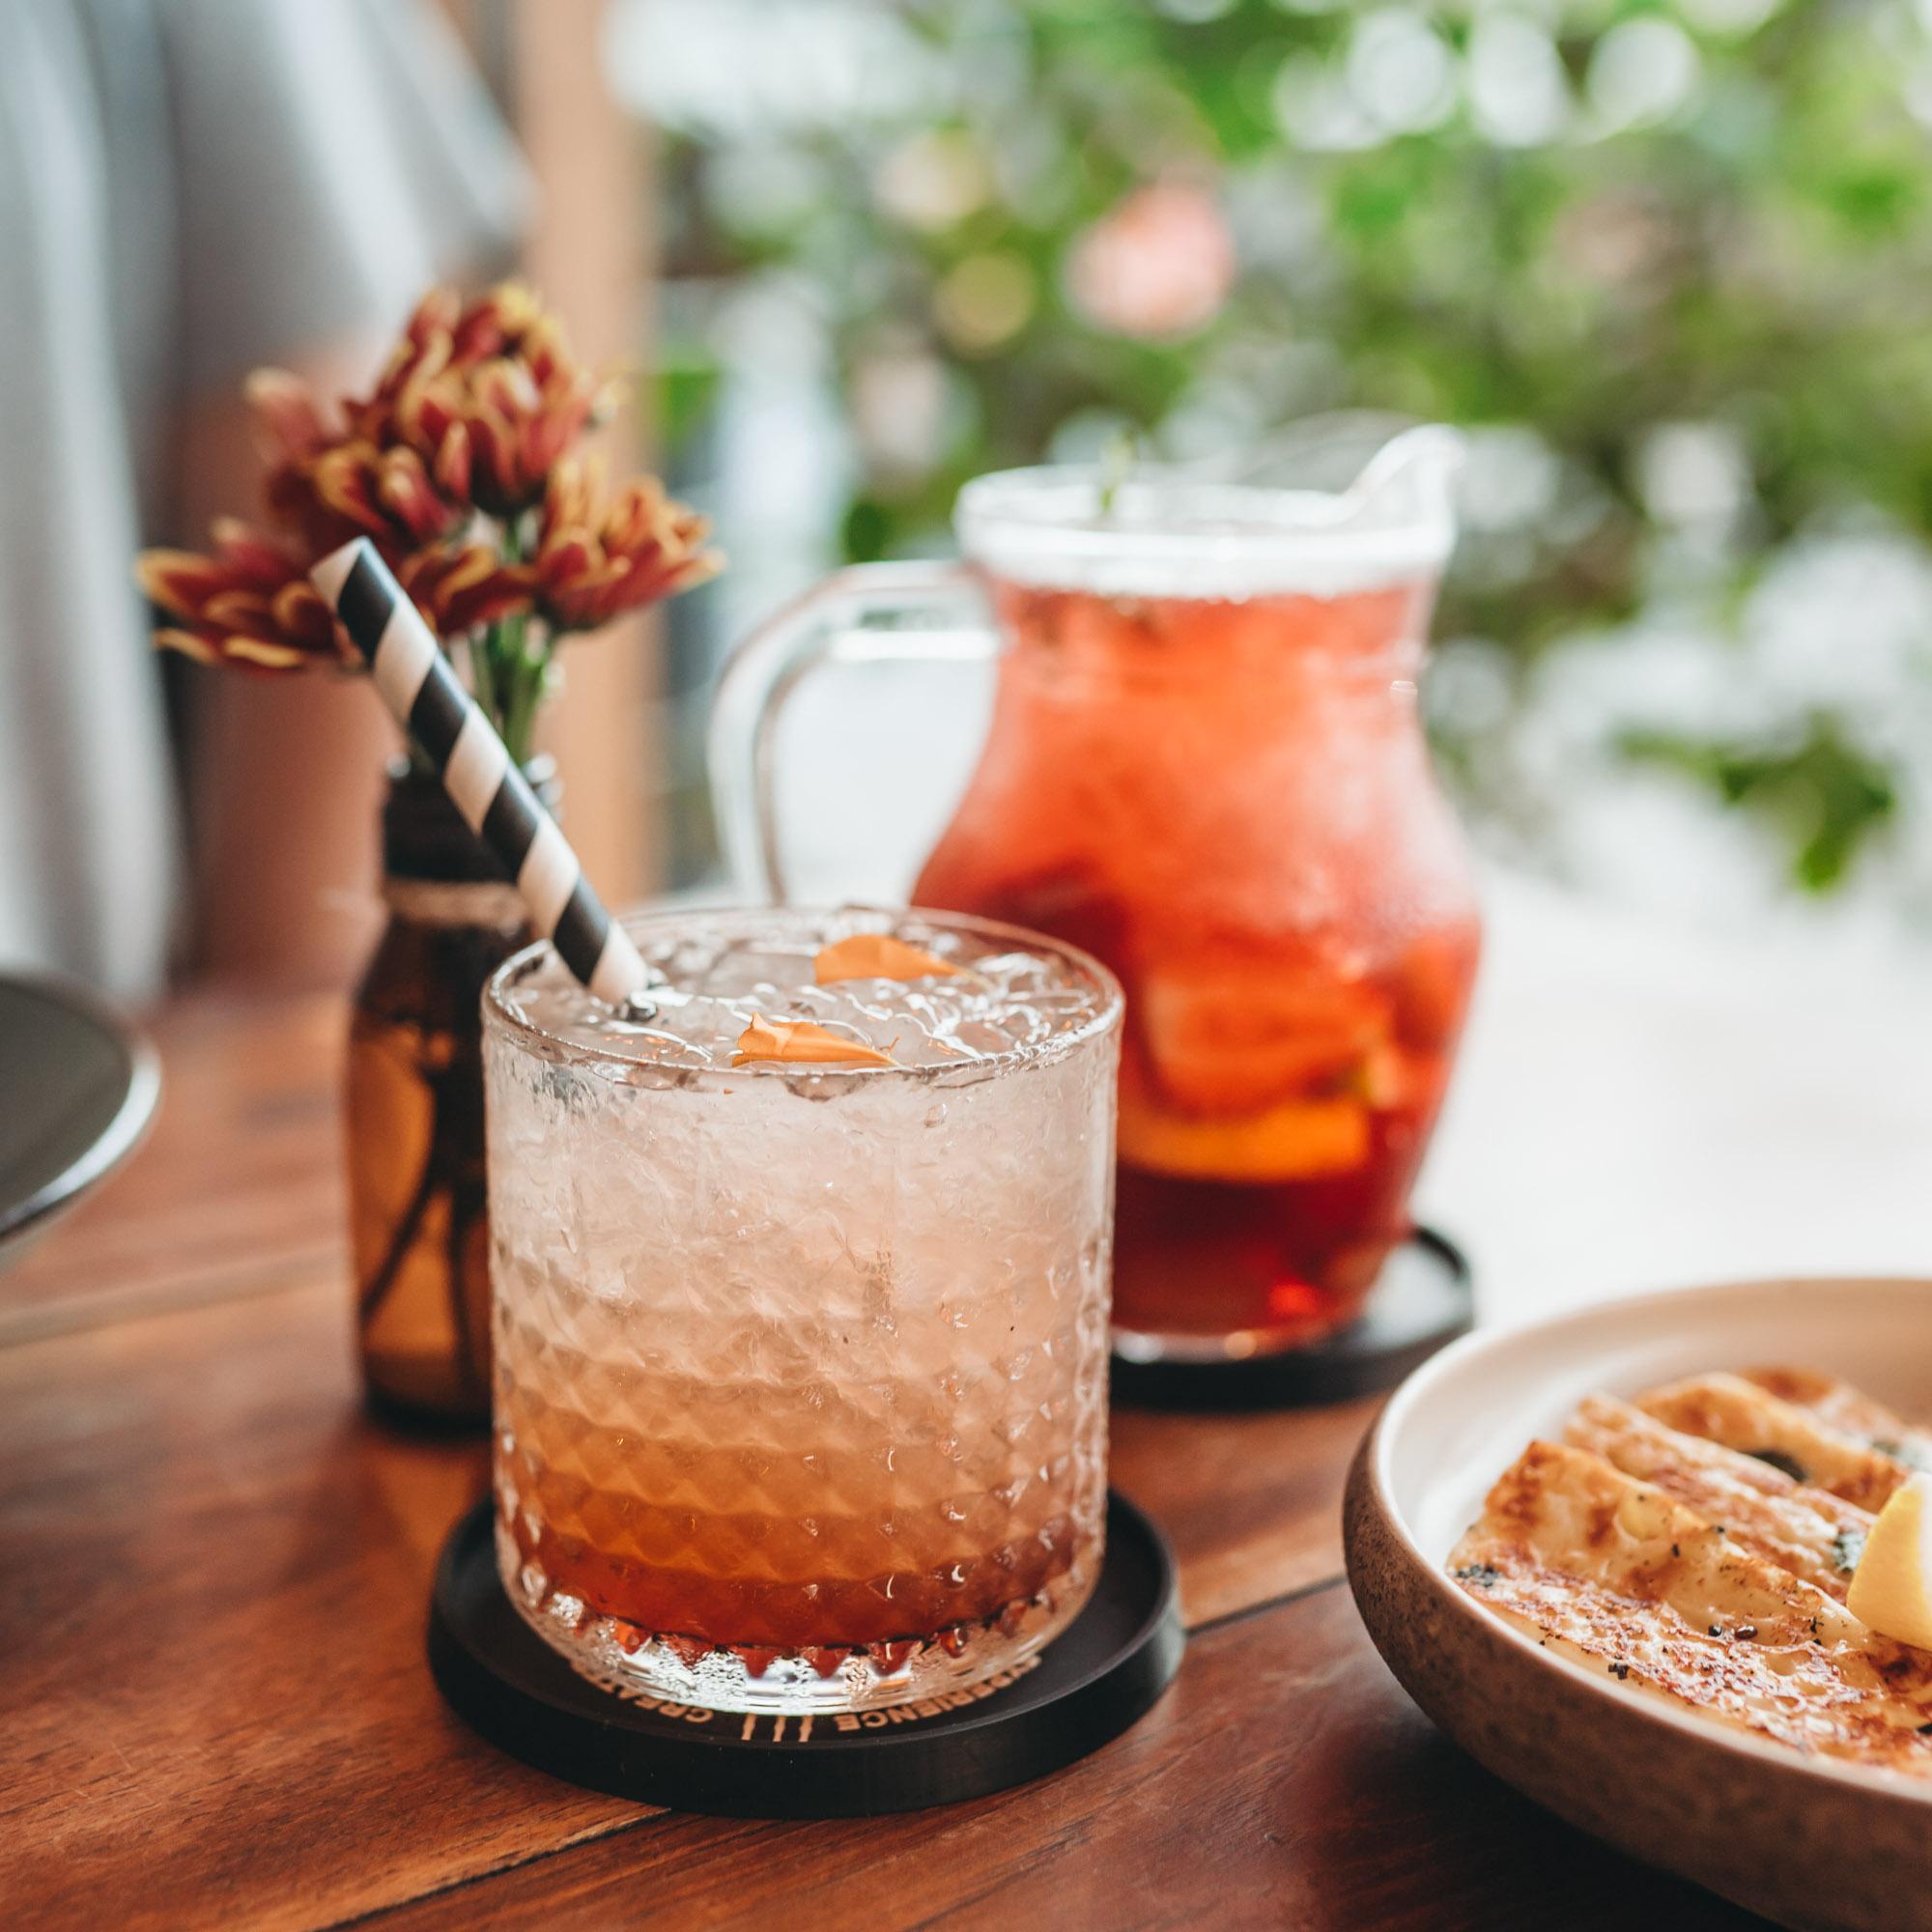 keira-mason-the-common-cocktail.jpg